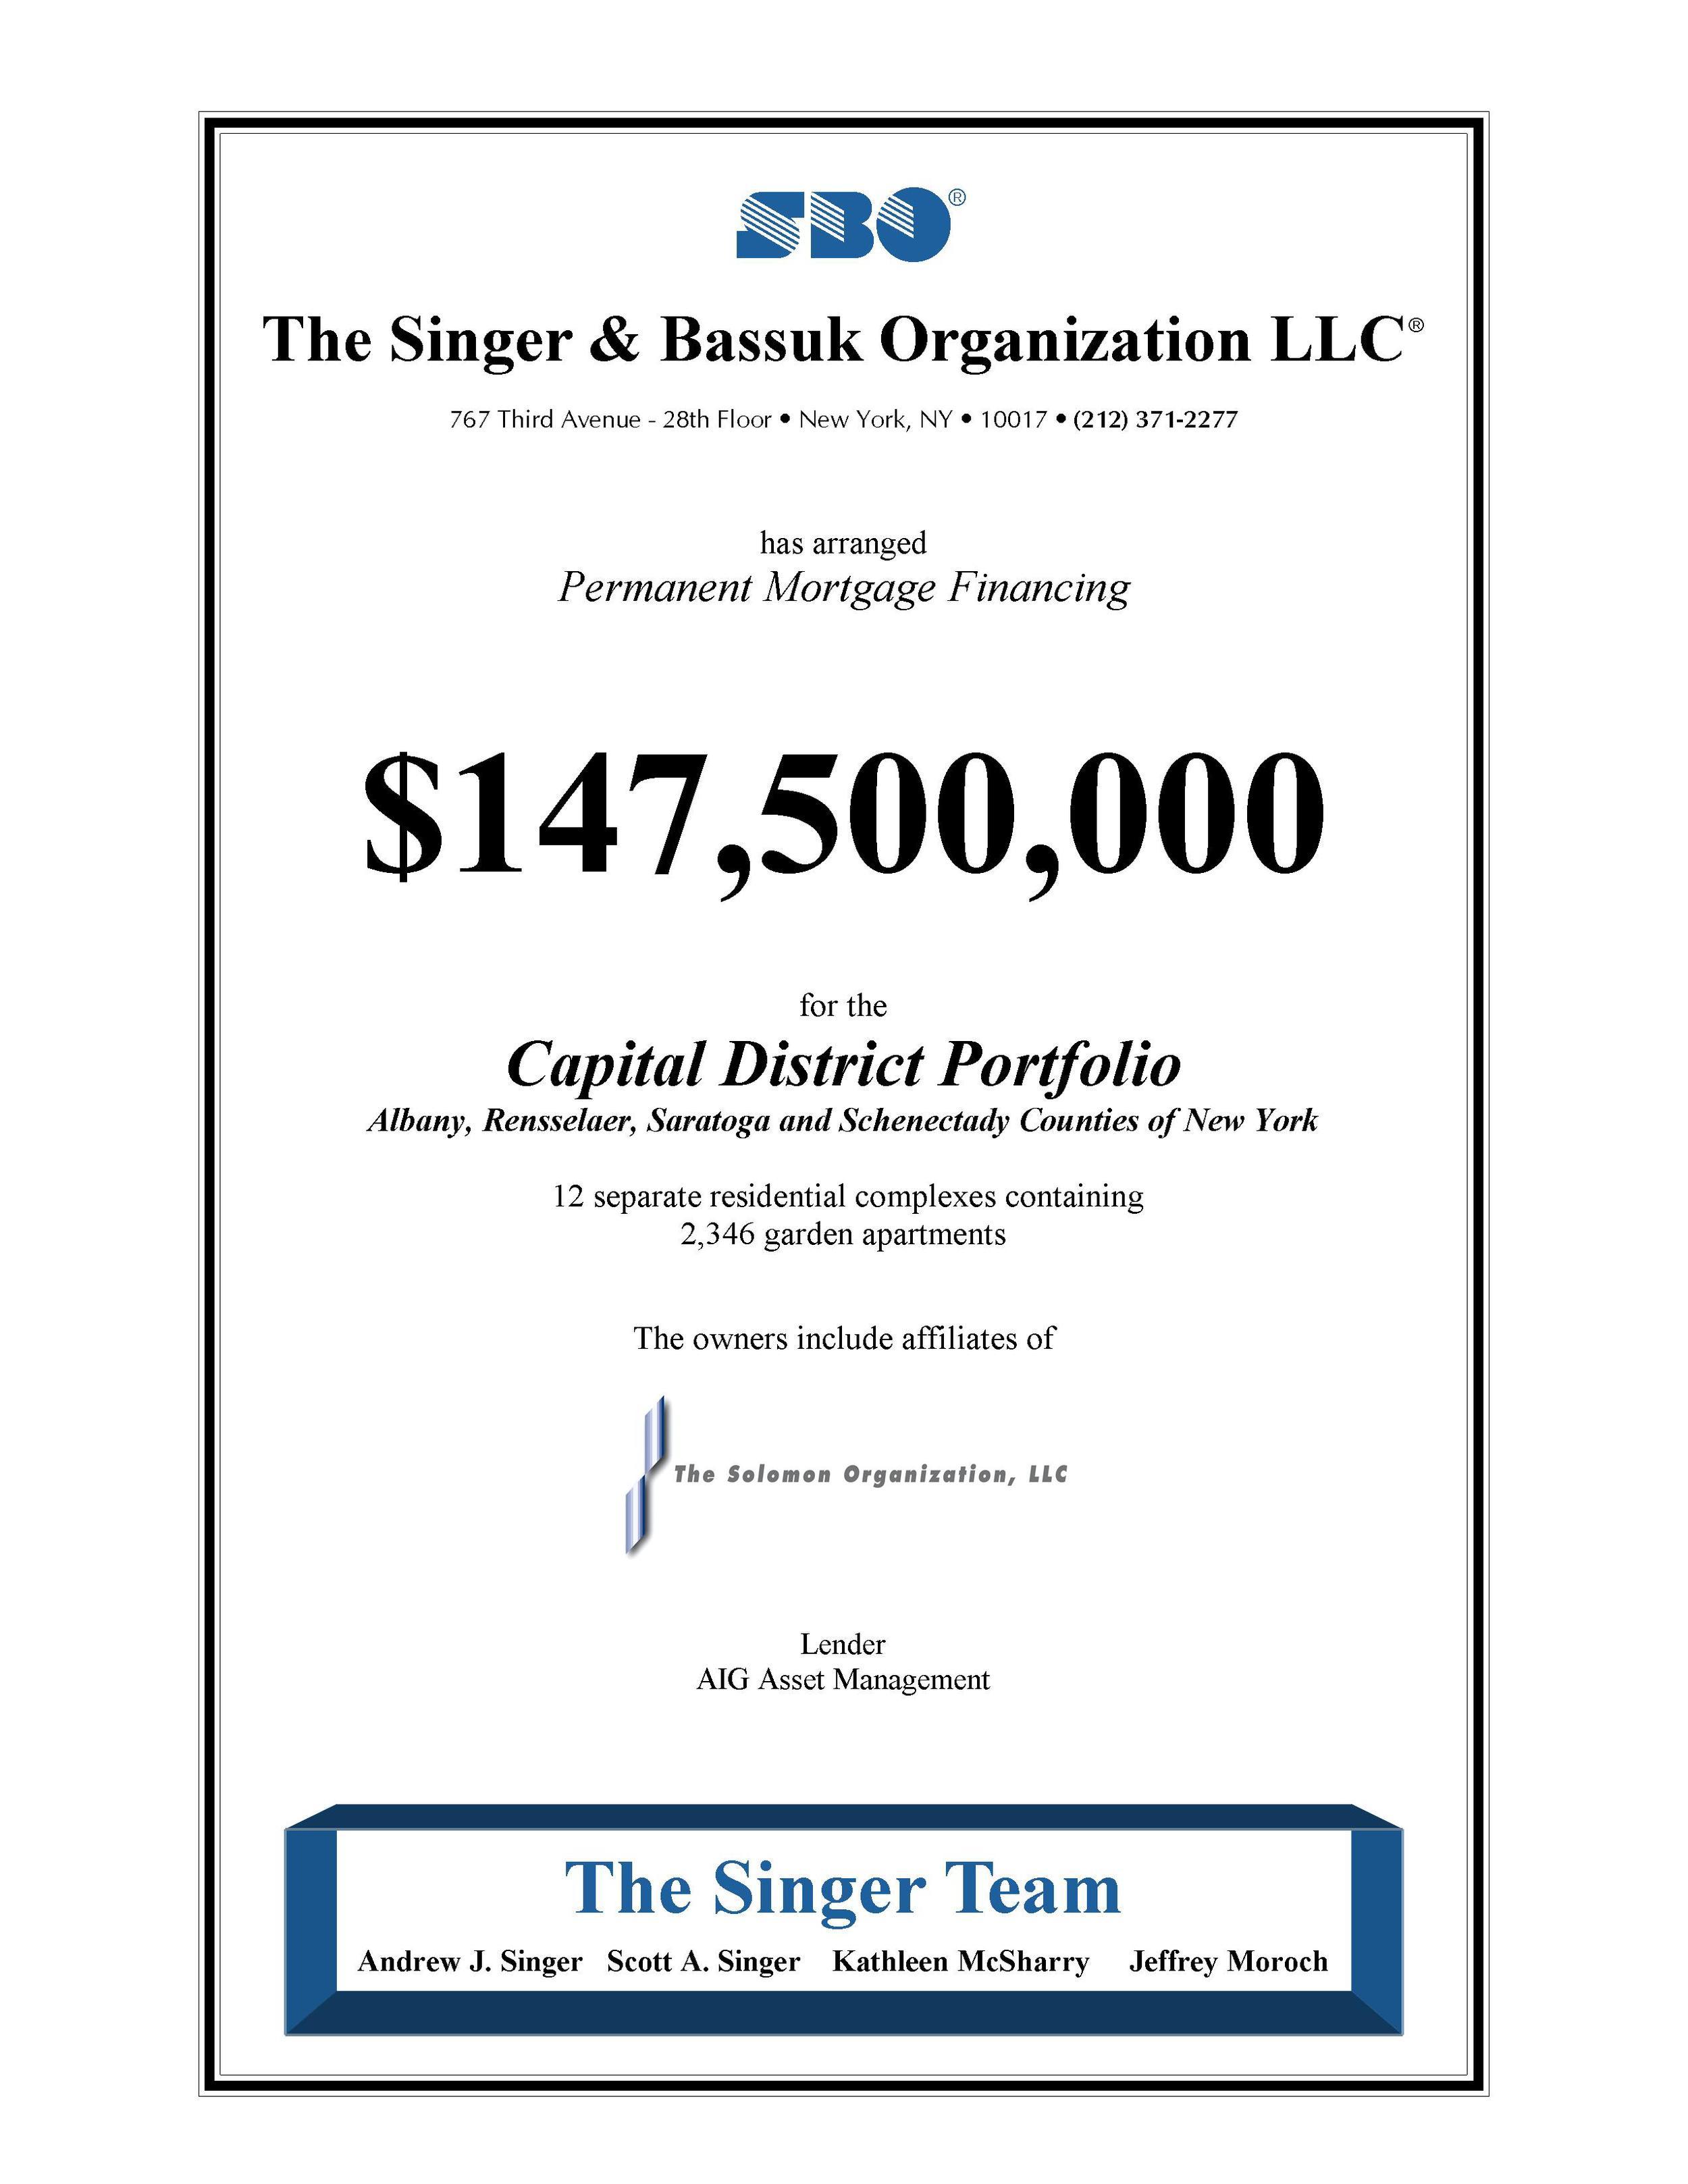 Capital District Portfolio with logo - 2012 refi tombstone Singer Team version 6.jpg